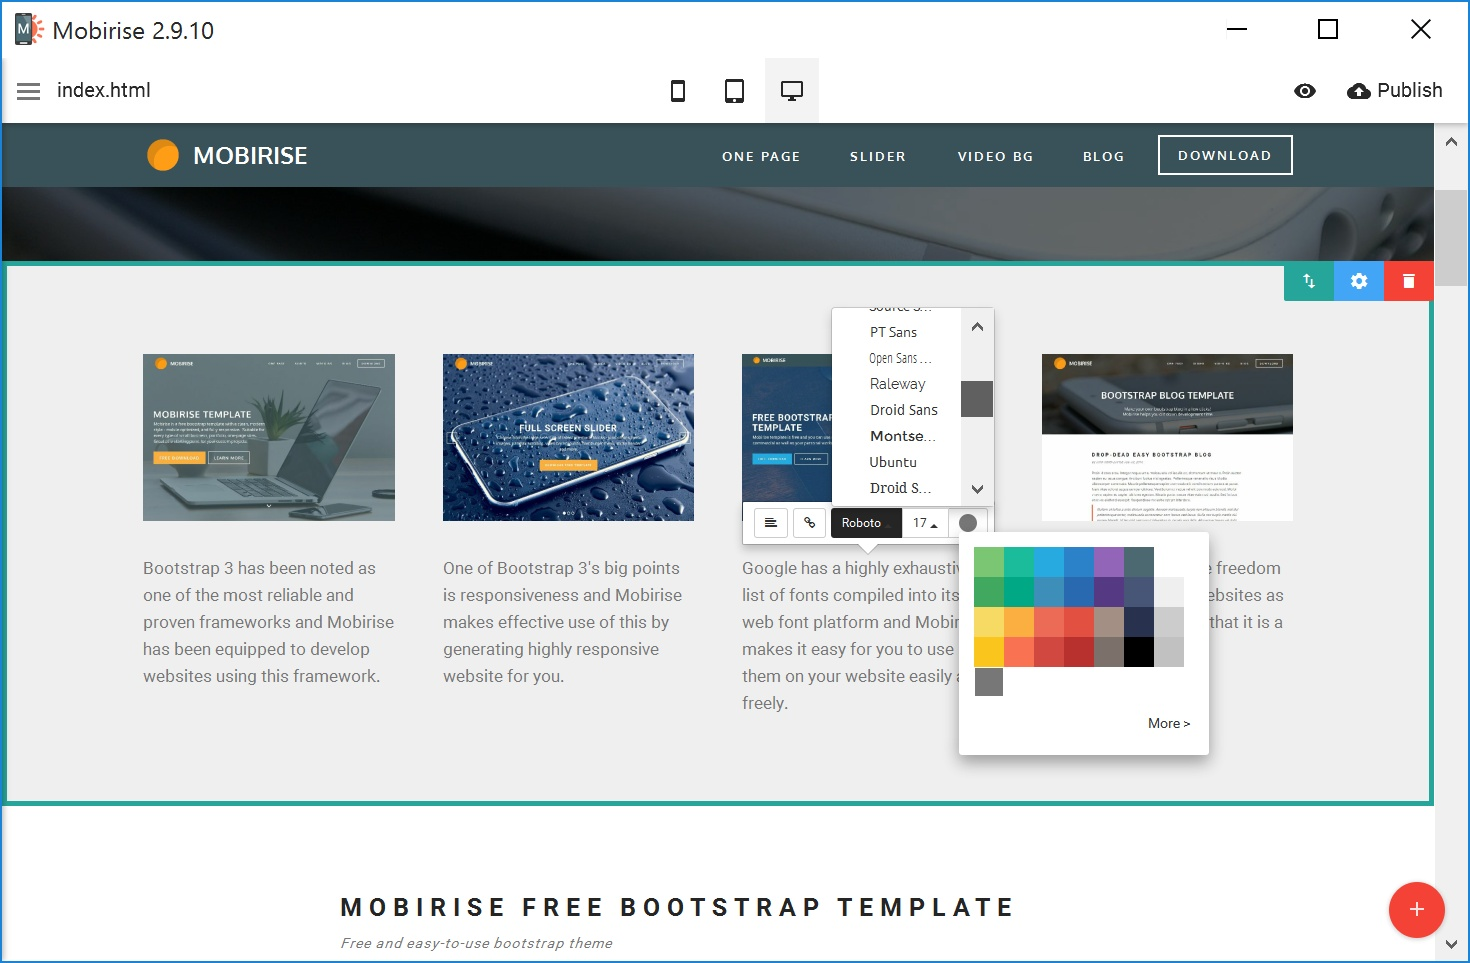 WYSIWYG Mobile Website Builder Software